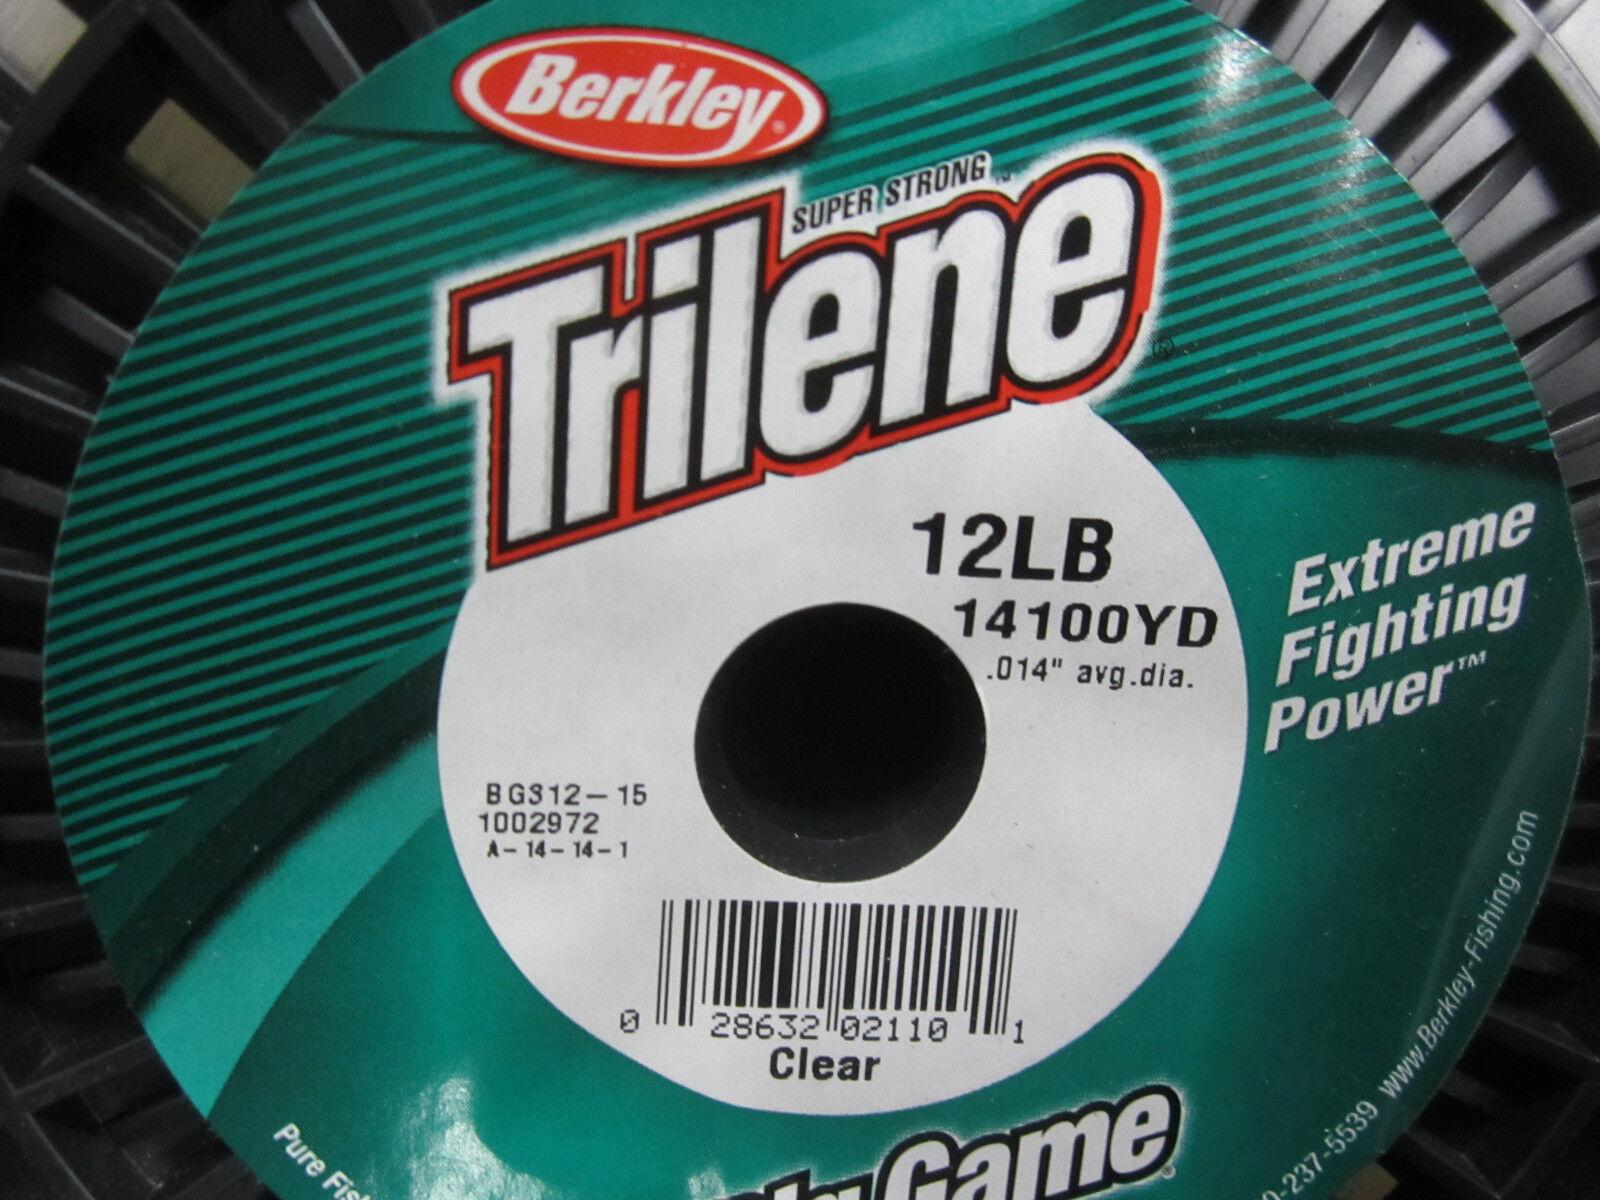 Berkley Trilene Big Game Ligne 12 LB (environ 5.44 kg) - 14100 Yds-Clair